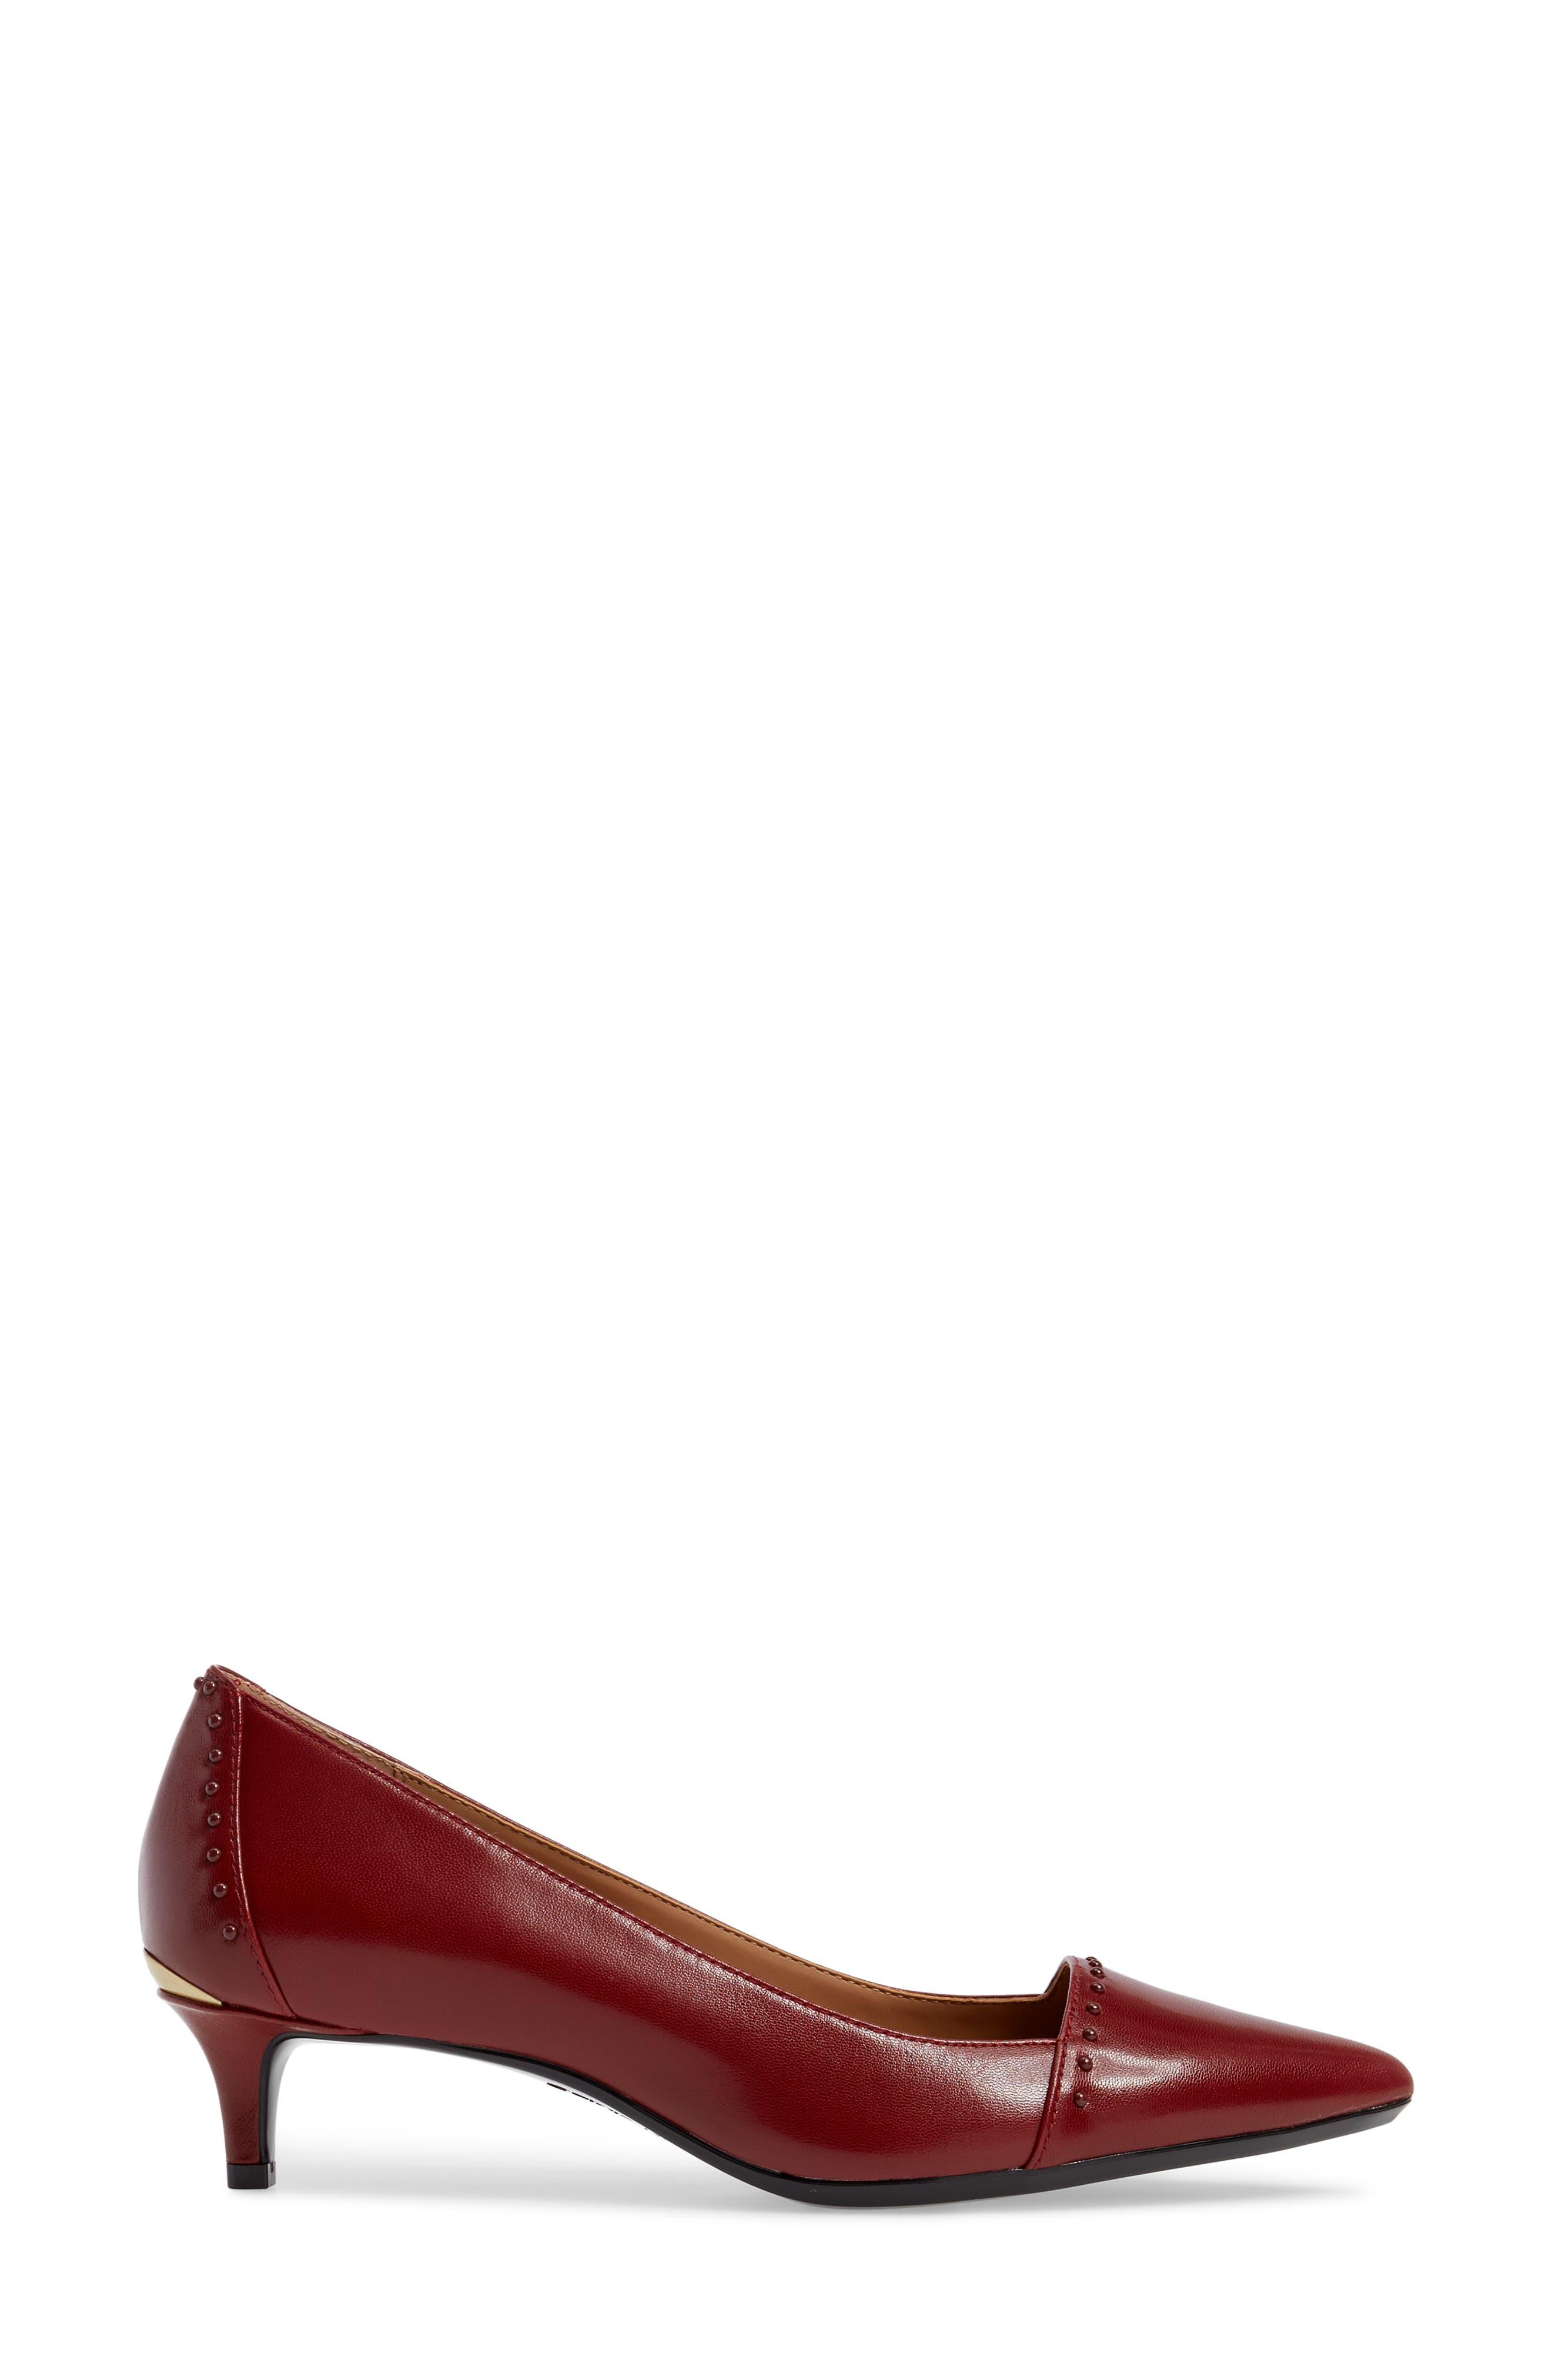 Griselda Studded Cap Toe Pump,                             Alternate thumbnail 3, color,                             Cherry Red